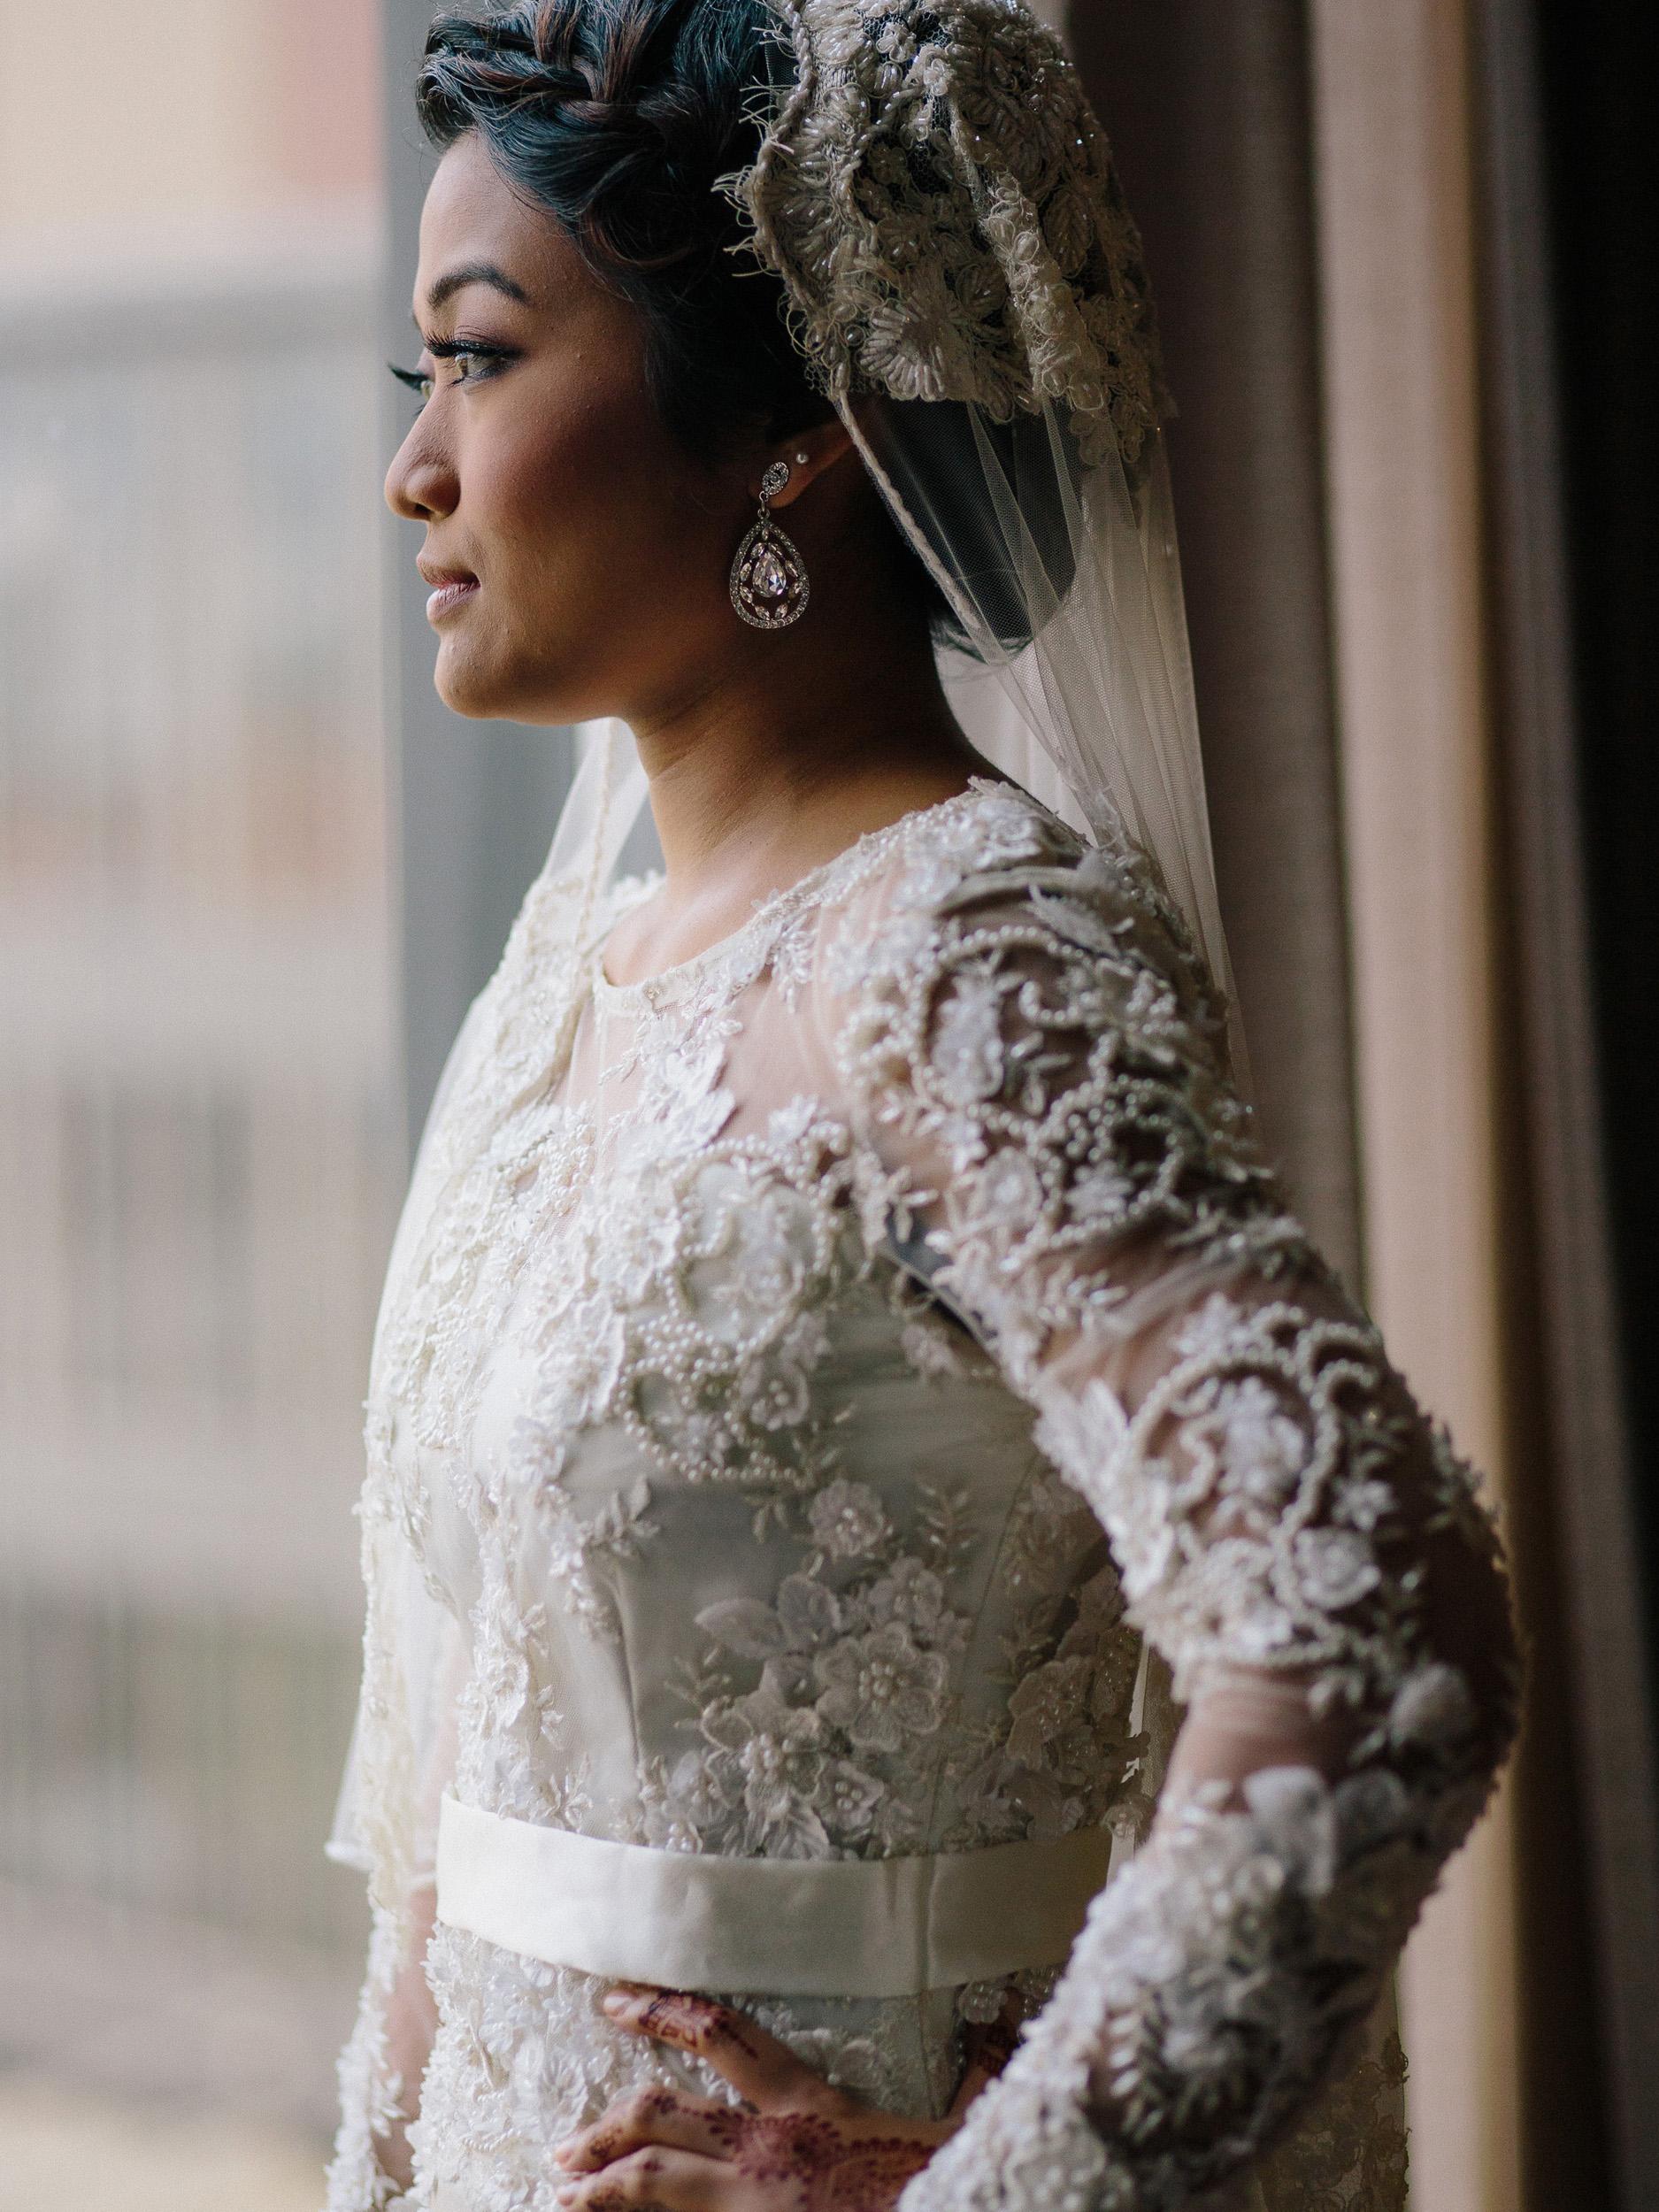 singapore-wedding-photographer-photography-wmt2017-067.jpg